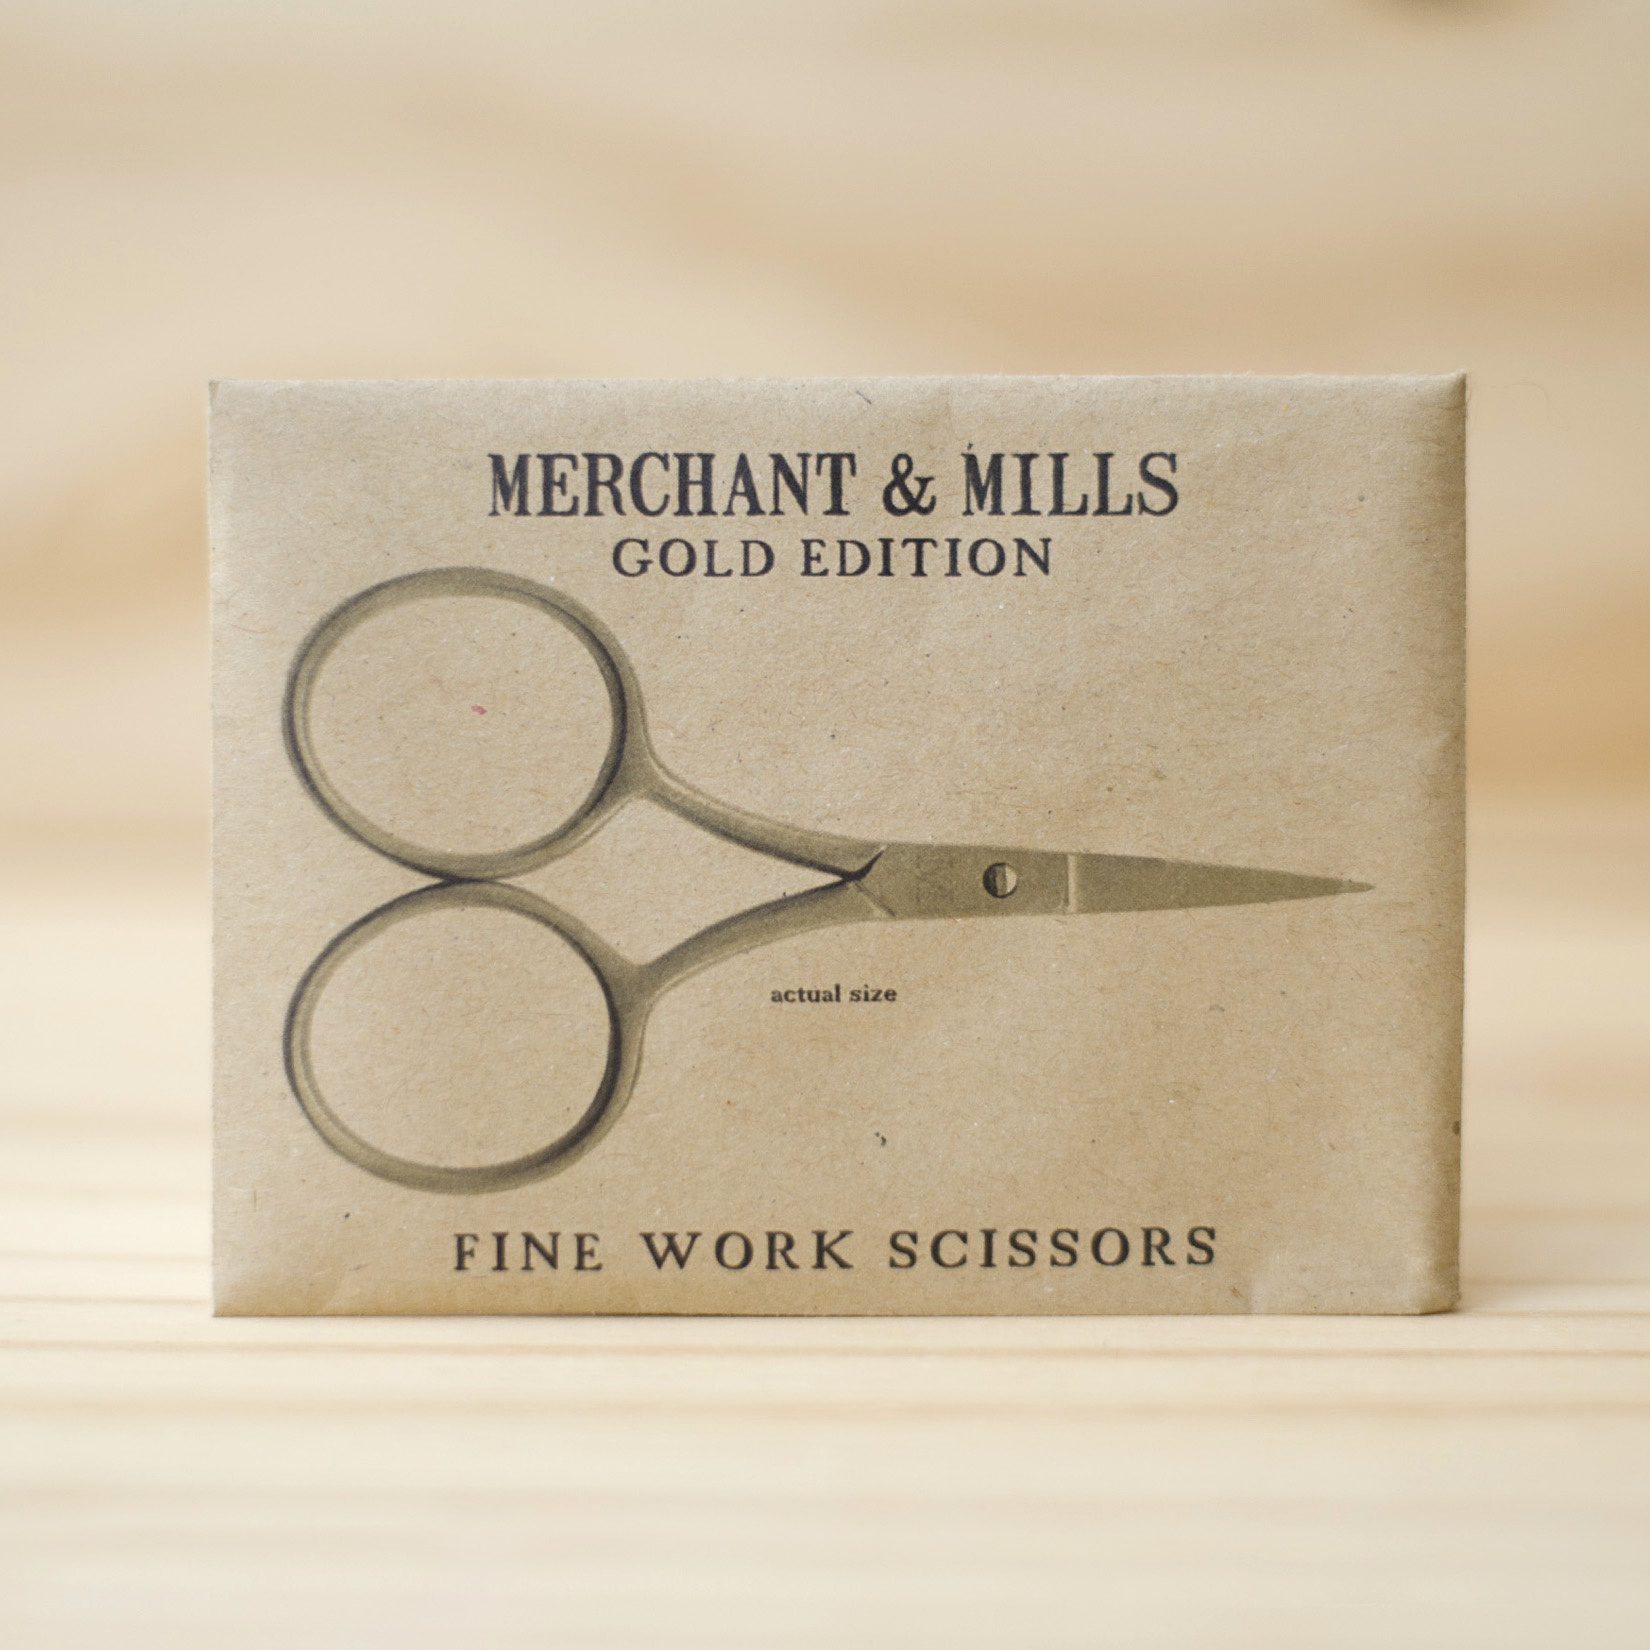 Merchant & Mills : Fine Work Scissors : Gold